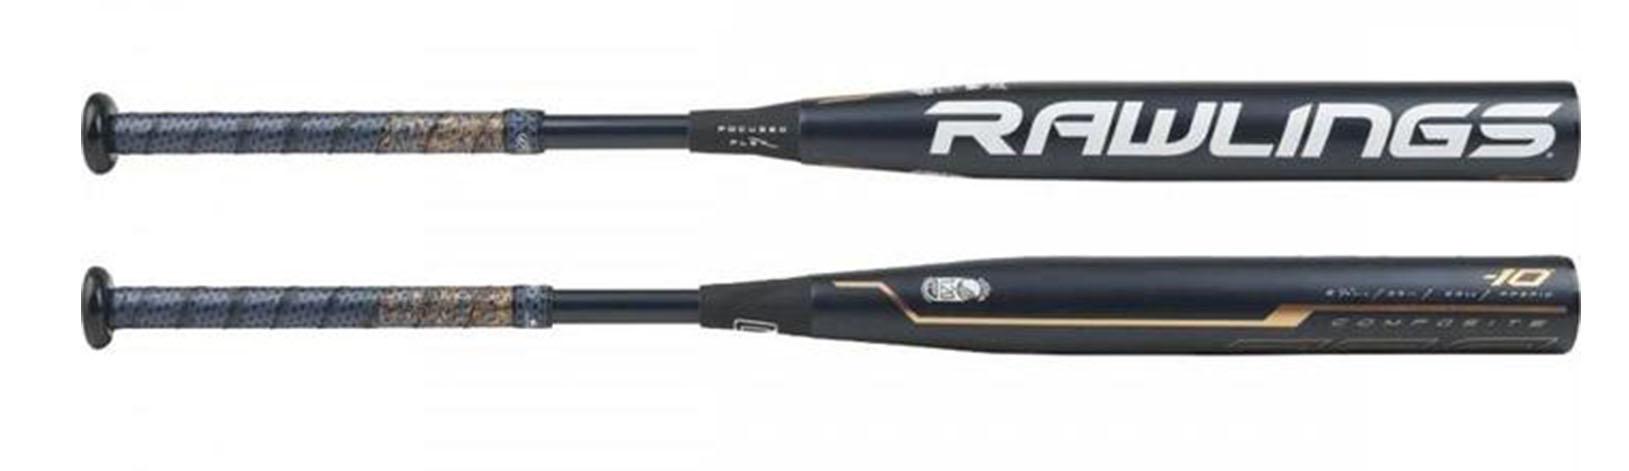 Rawlings Quatro Pro 2020 Softball Fastpitch Bat